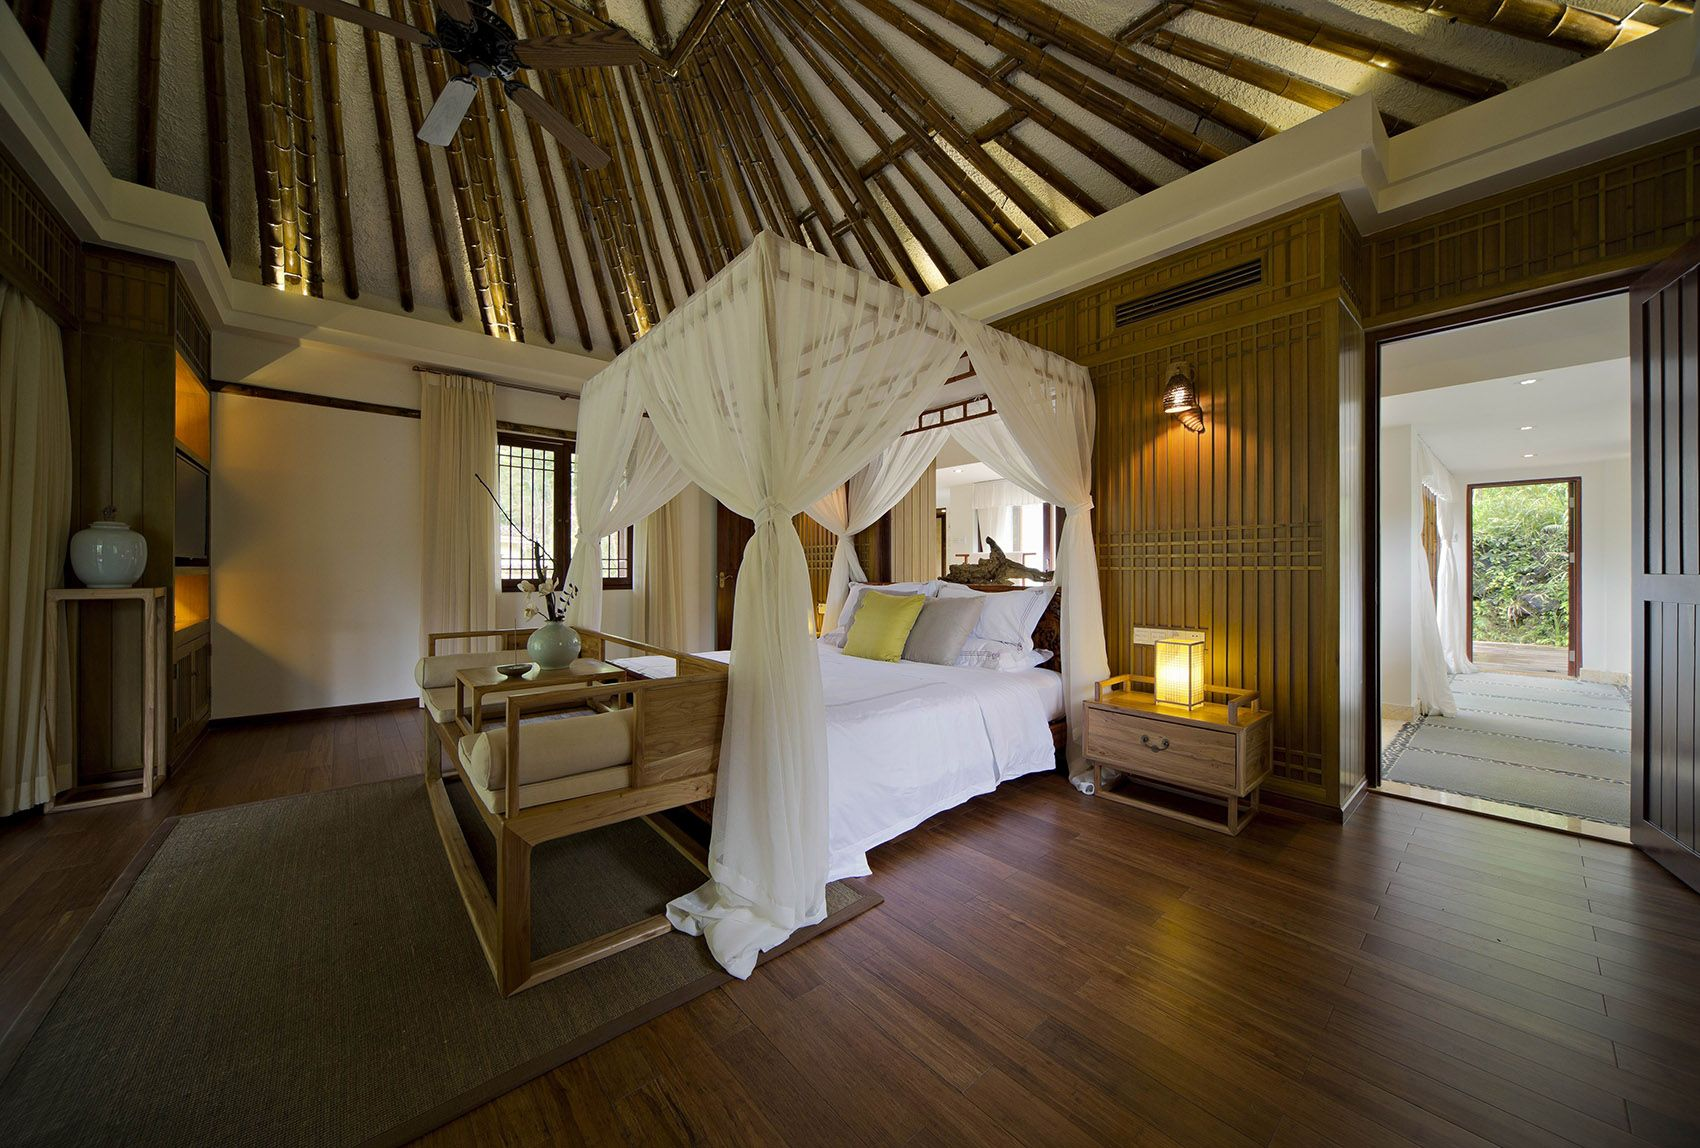 Bamboo-Villa-by-CC-Design-调整大小-05.jpg (1700×1148)